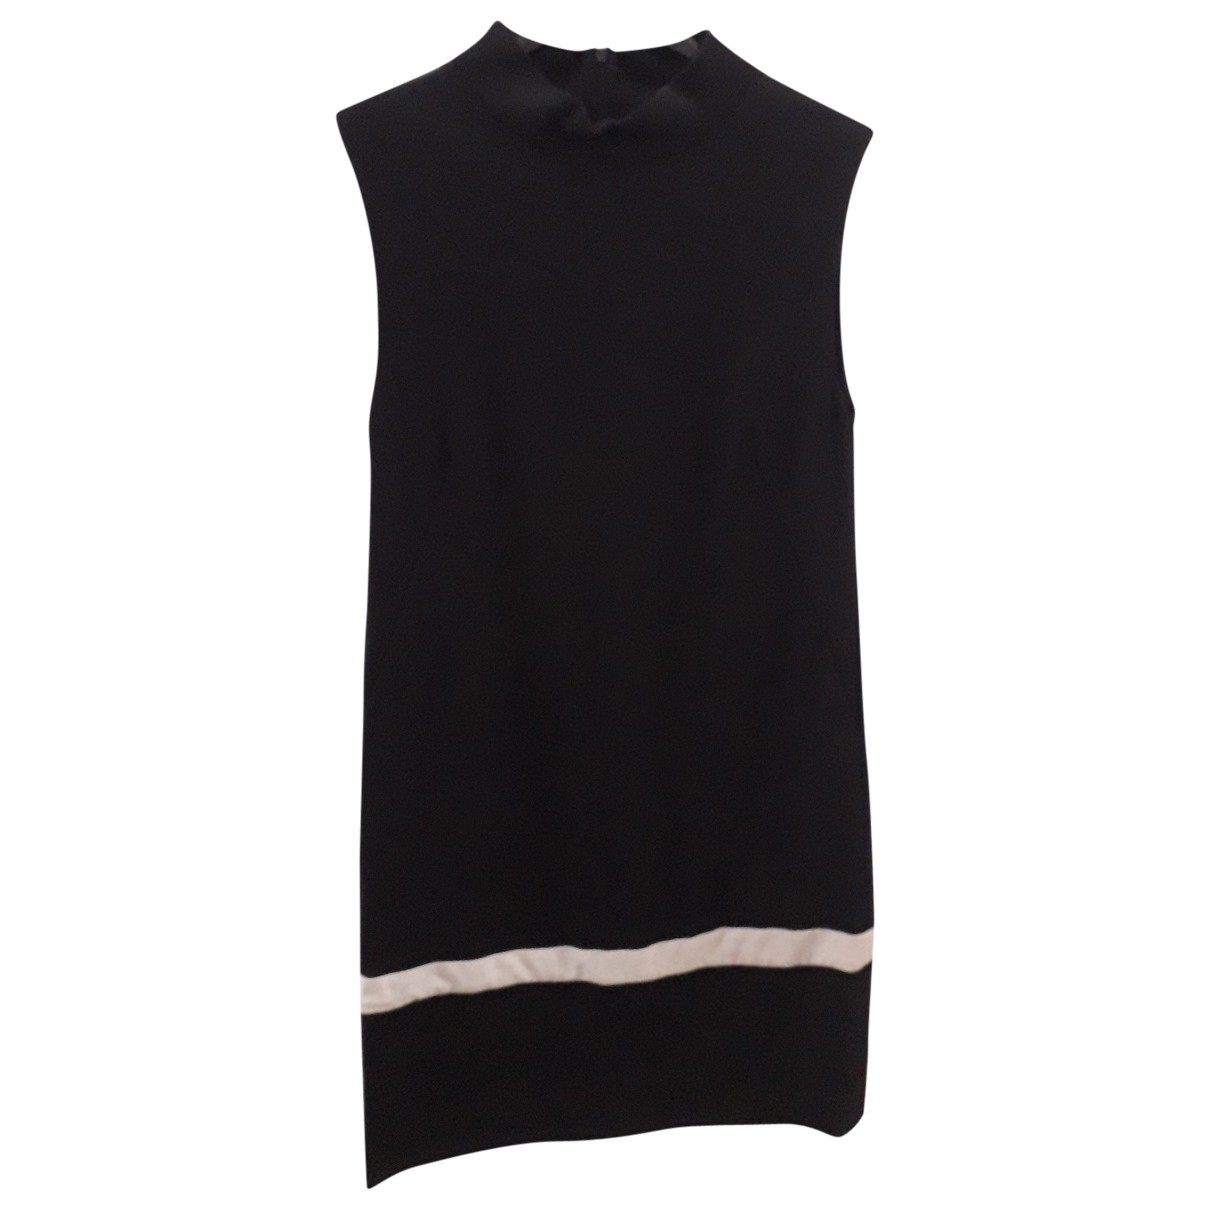 Msgm \N Kleid in  Schwarz Synthetik